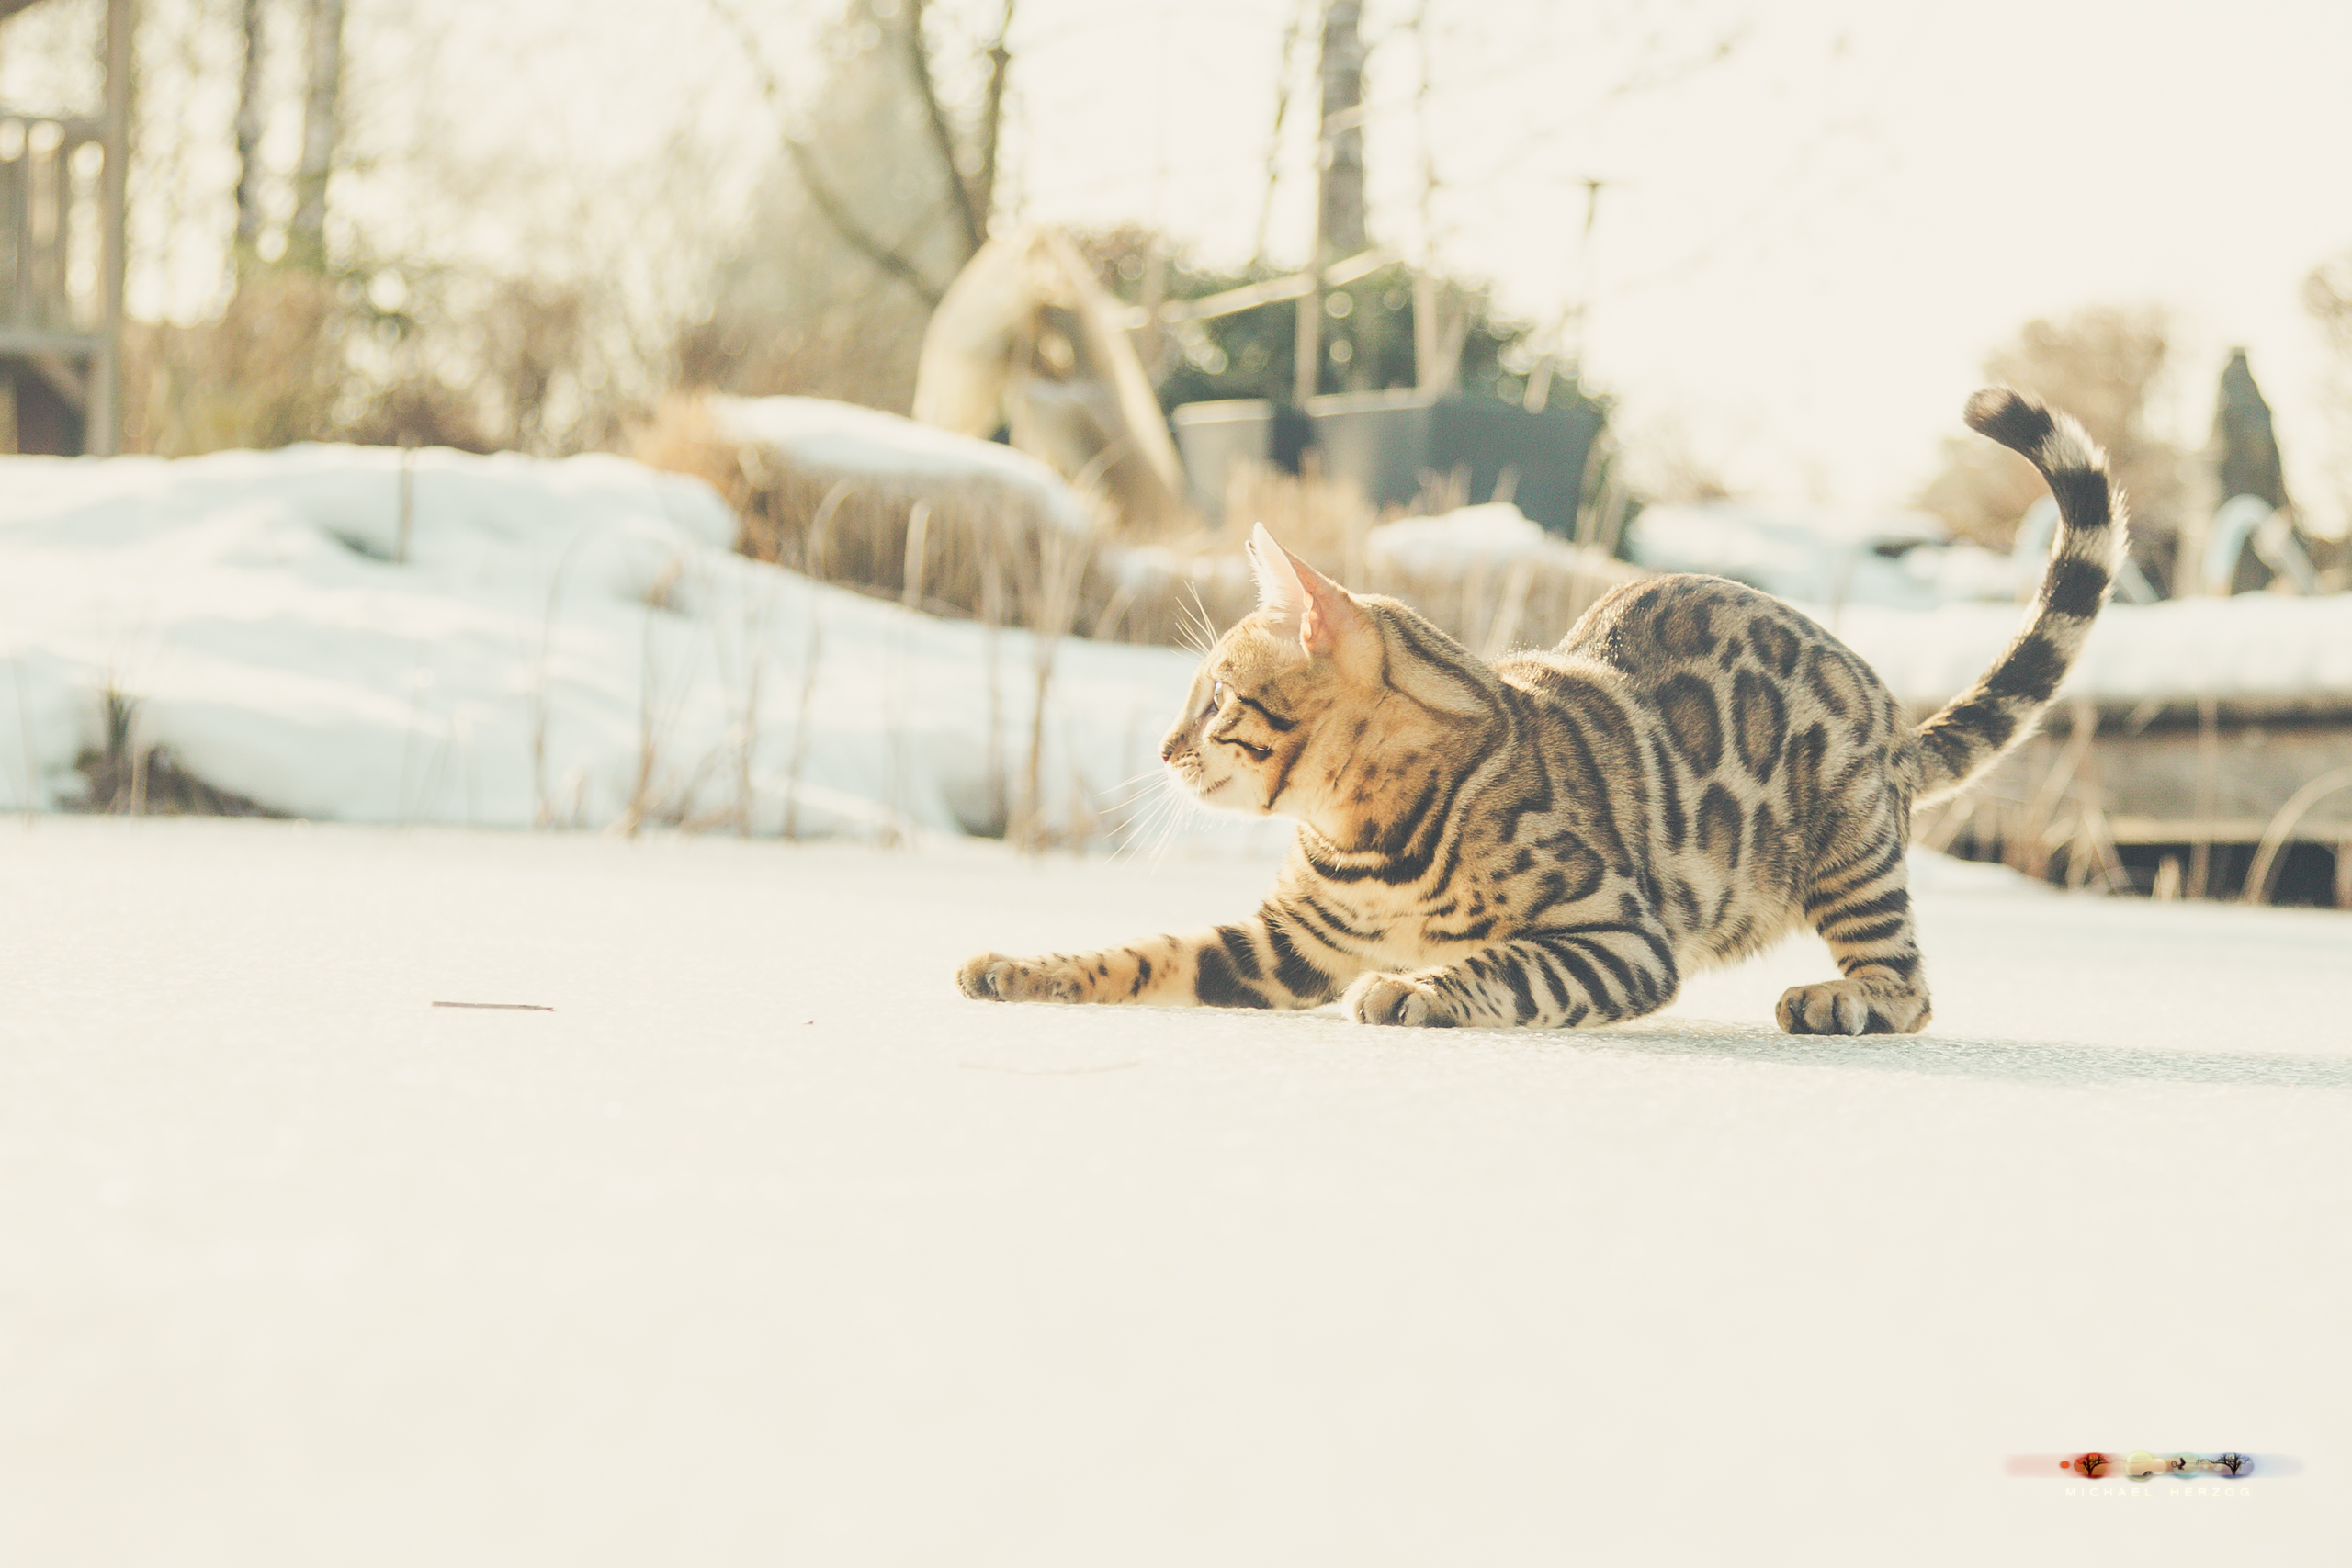 BALUARI_Winter2019_Garten_MichaelHerzog-8981.jpg